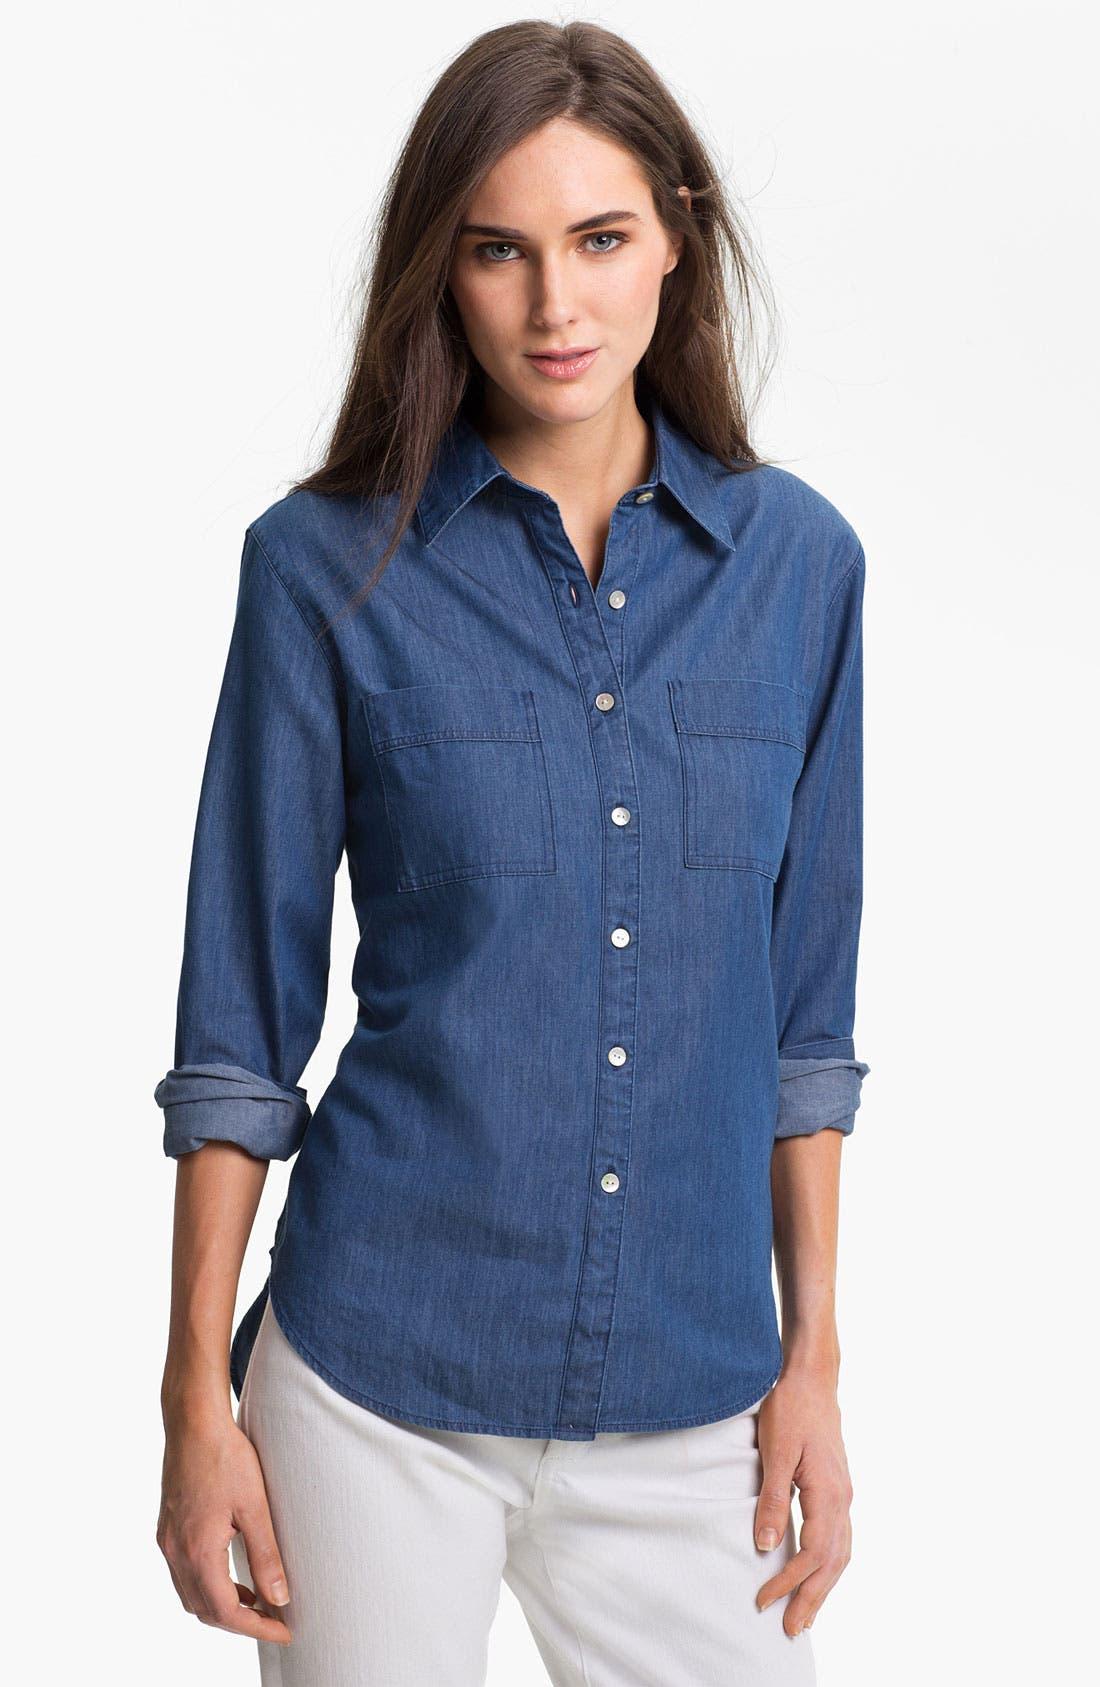 Alternate Image 1 Selected - Foxcroft Two Pocket Denim Shirt